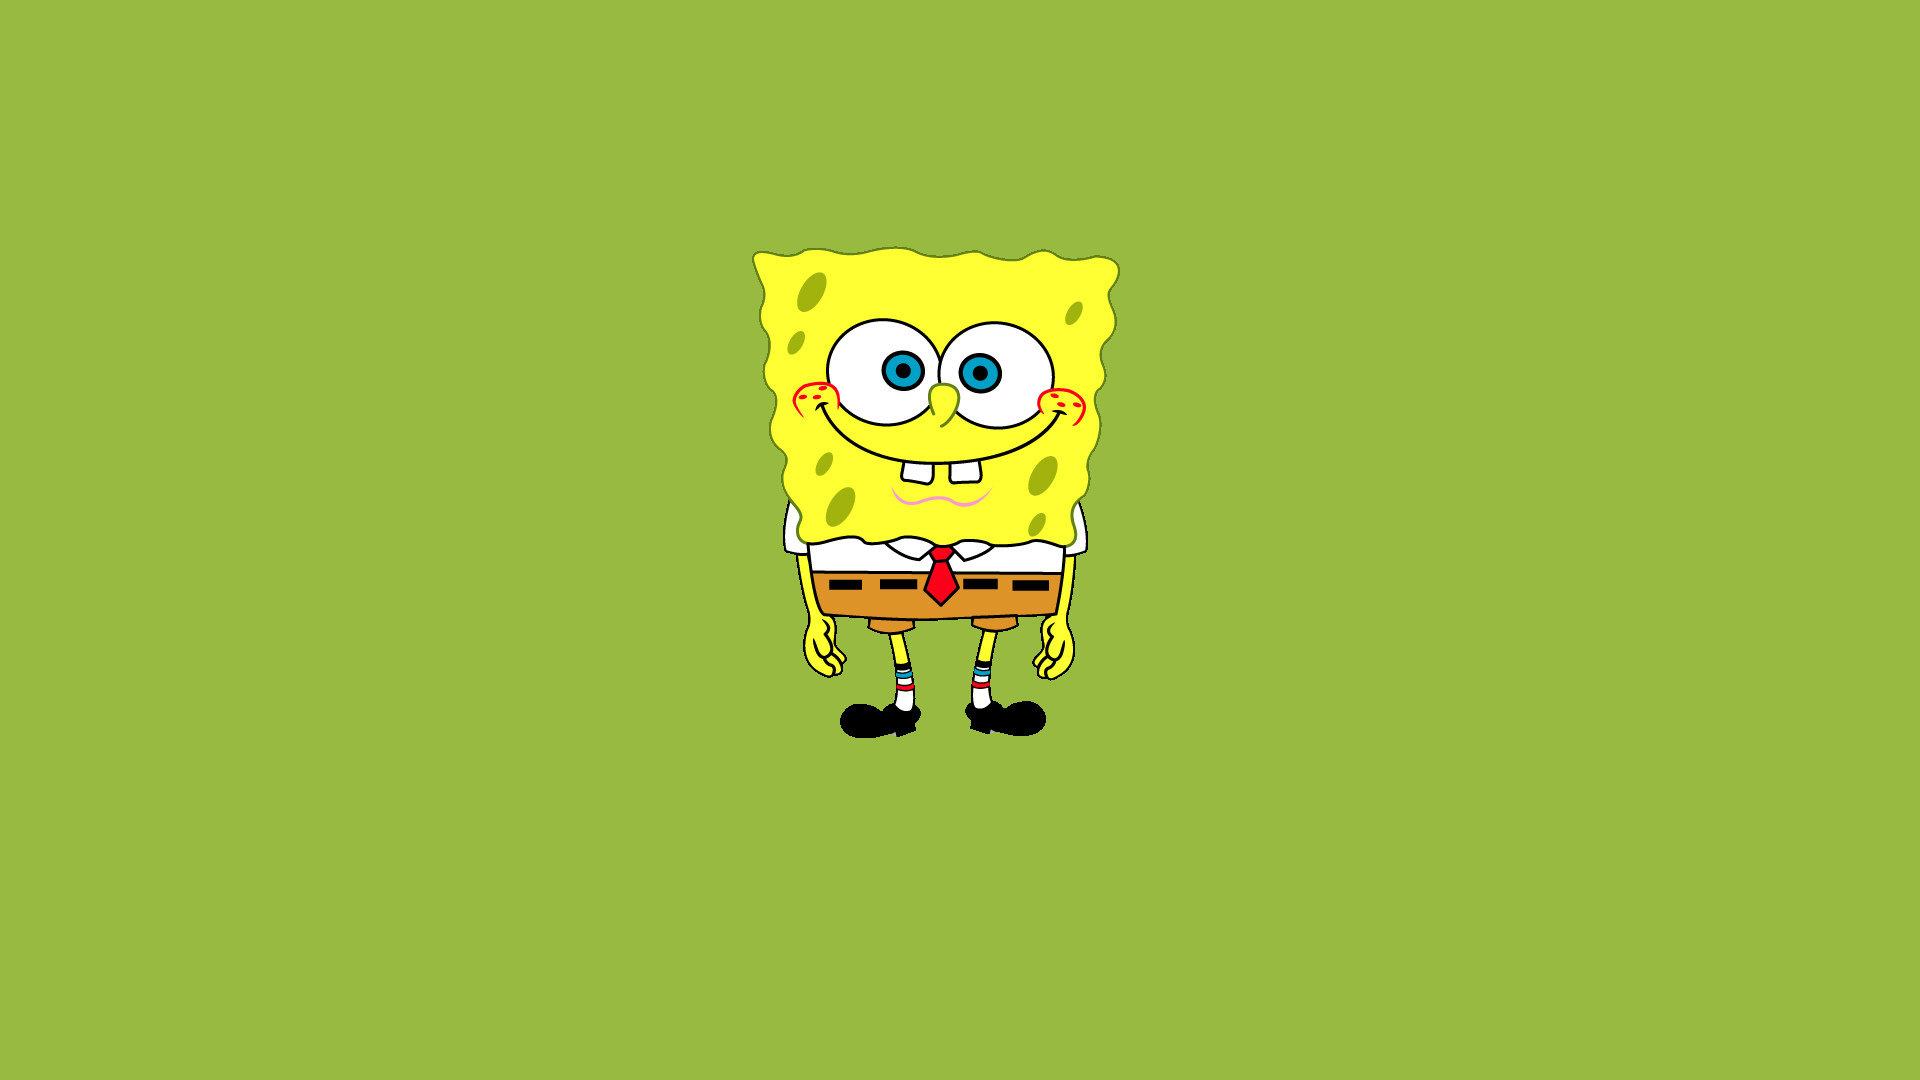 Download Full Hd 1920x1080 Spongebob Squarepants Desktop Background